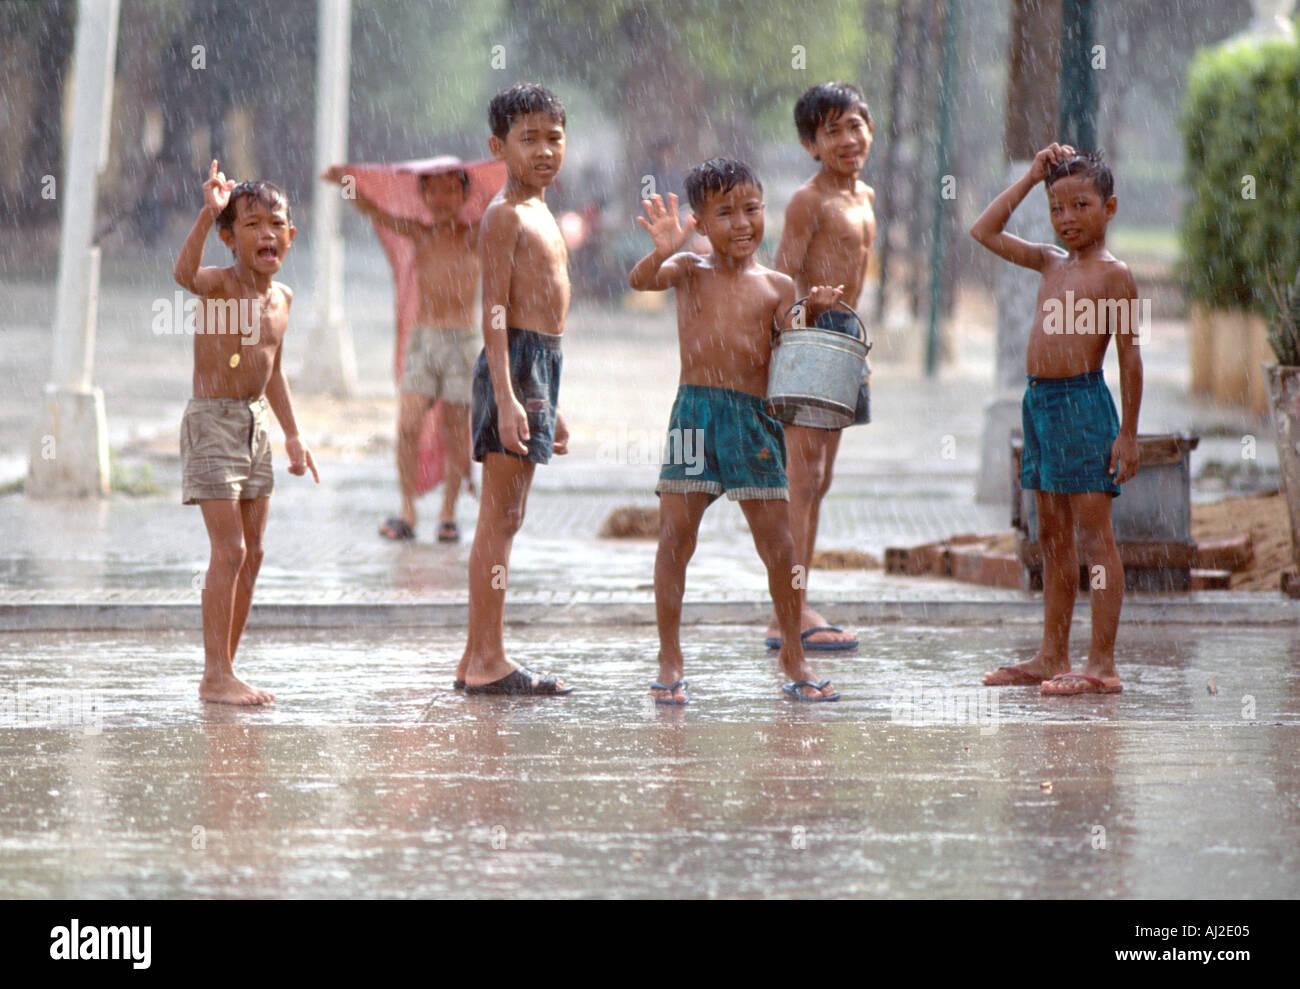 https://c7.alamy.com/comp/AJ2E05/boys-waving-and-playing-in-pouring-monsoon-rain-phnom-penh-cambodia-AJ2E05.jpg